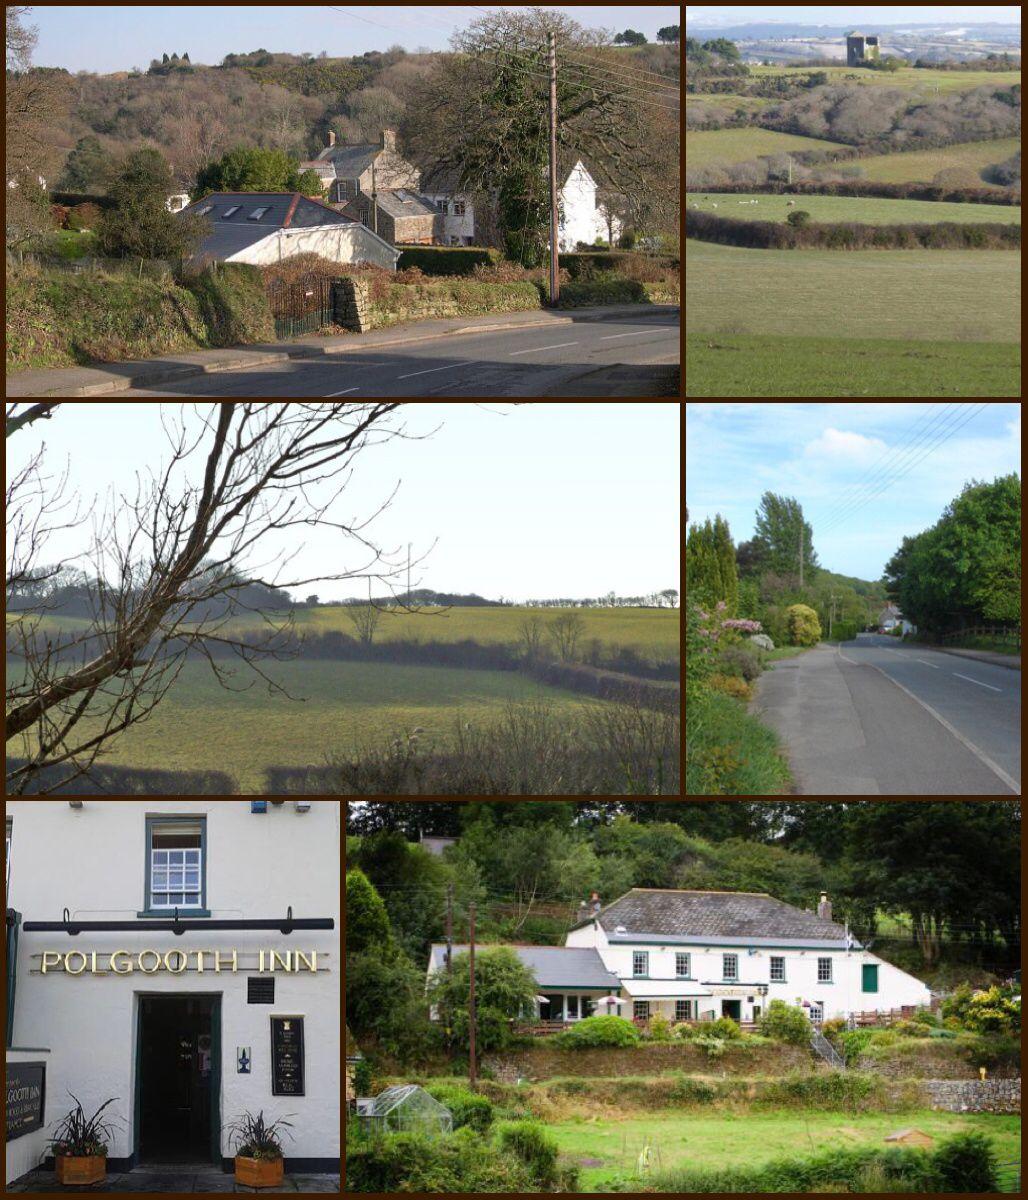 Polgooth (Cornish Pollgoodh) is a former mining village